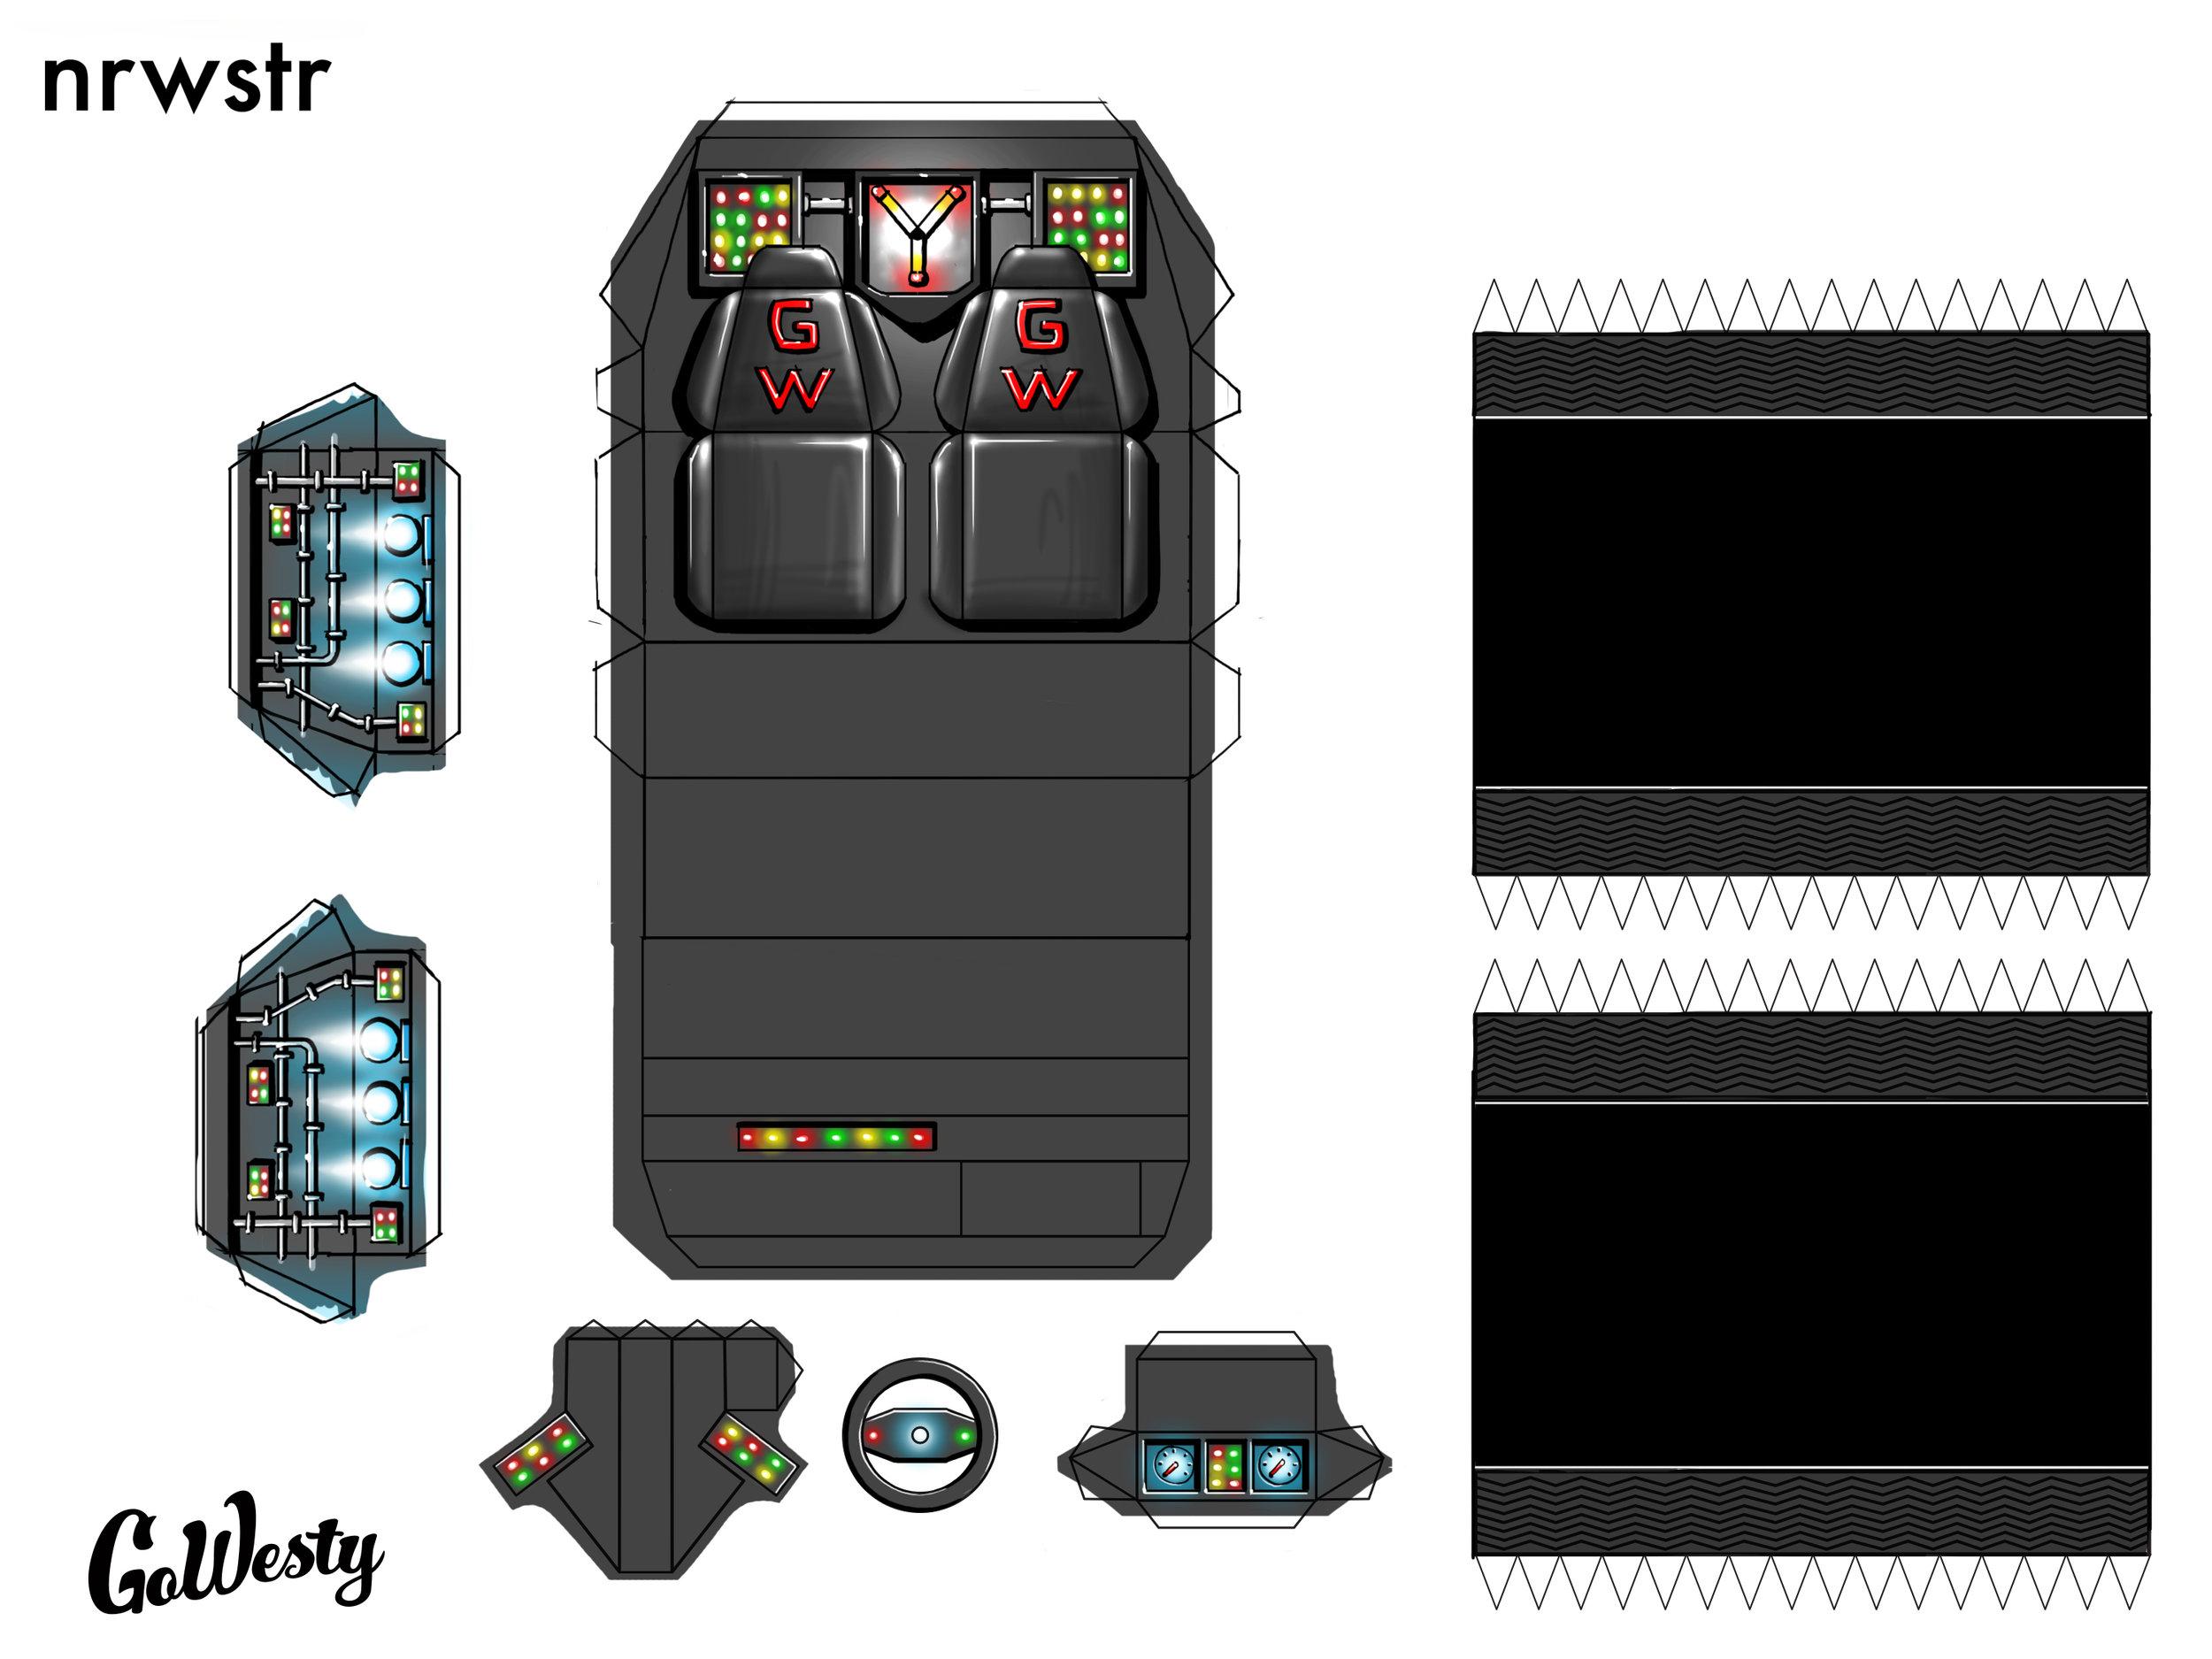 3d-back-to-the-future-van-p2.jpg